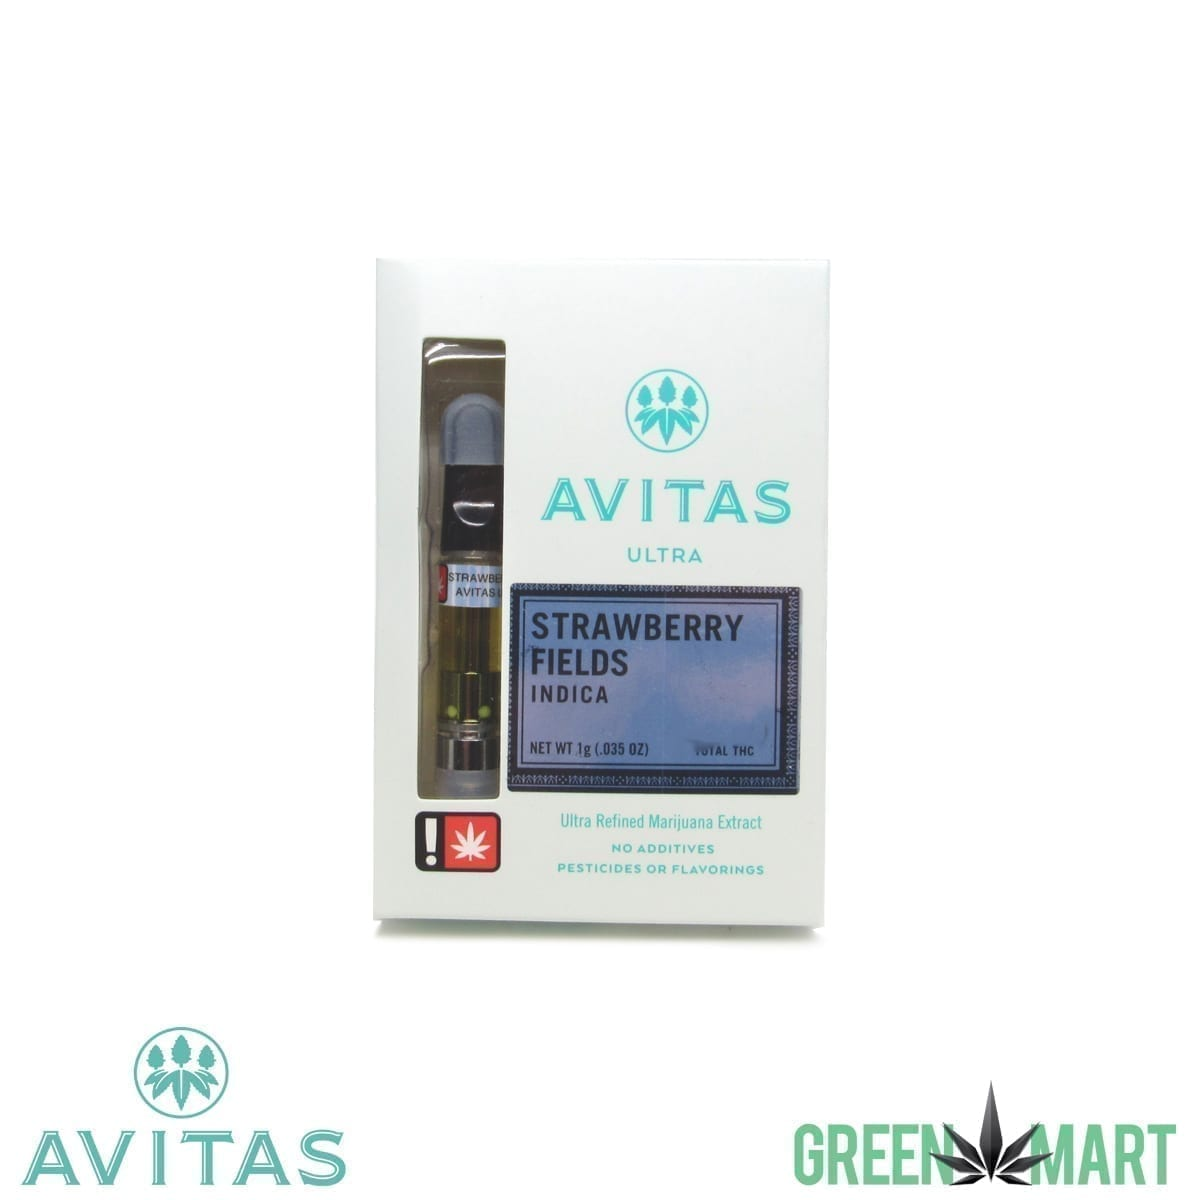 Avitas Live Resin Cartridge - Strawberry Fields 1g